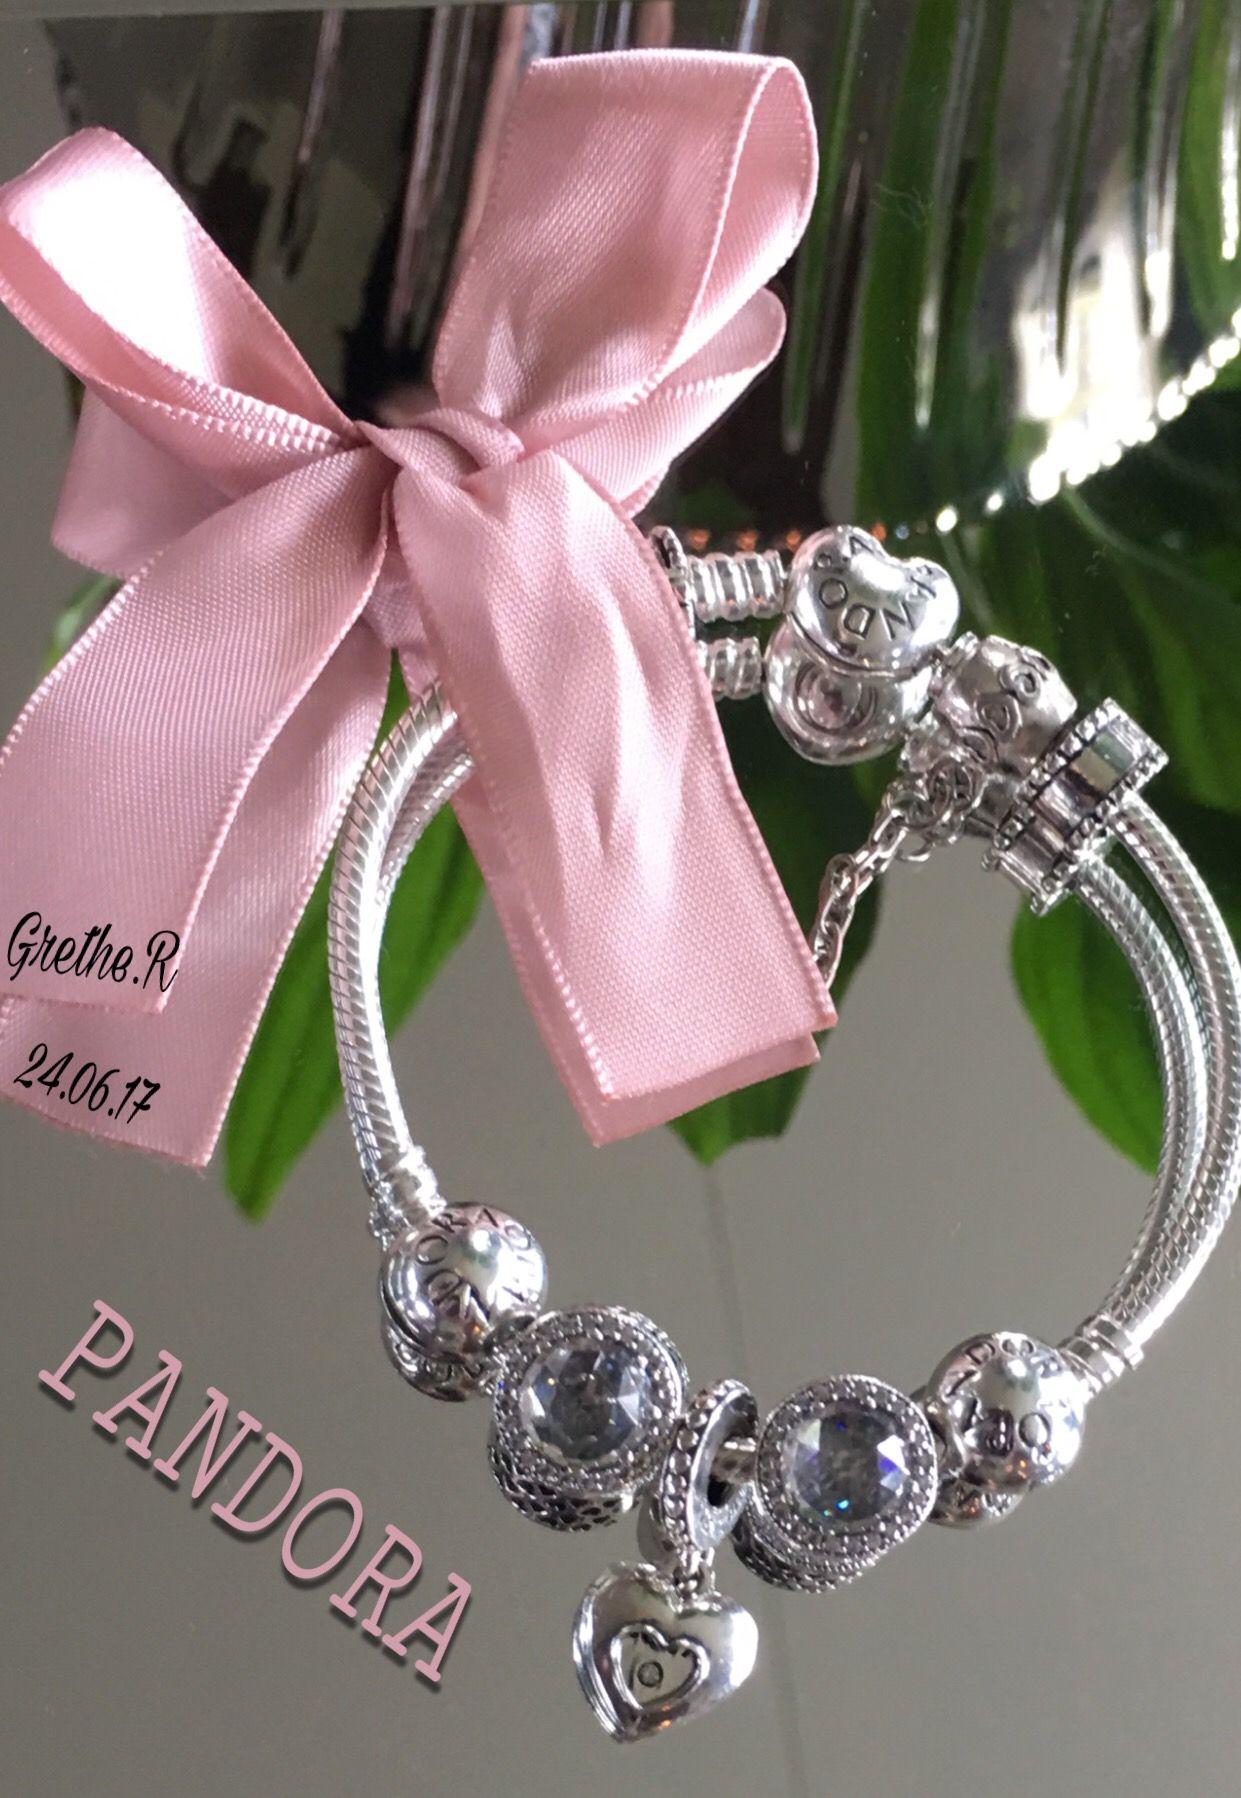 Pandora, Norway | Pandora Only, (Grethe) | Pinterest | Bracelets ...